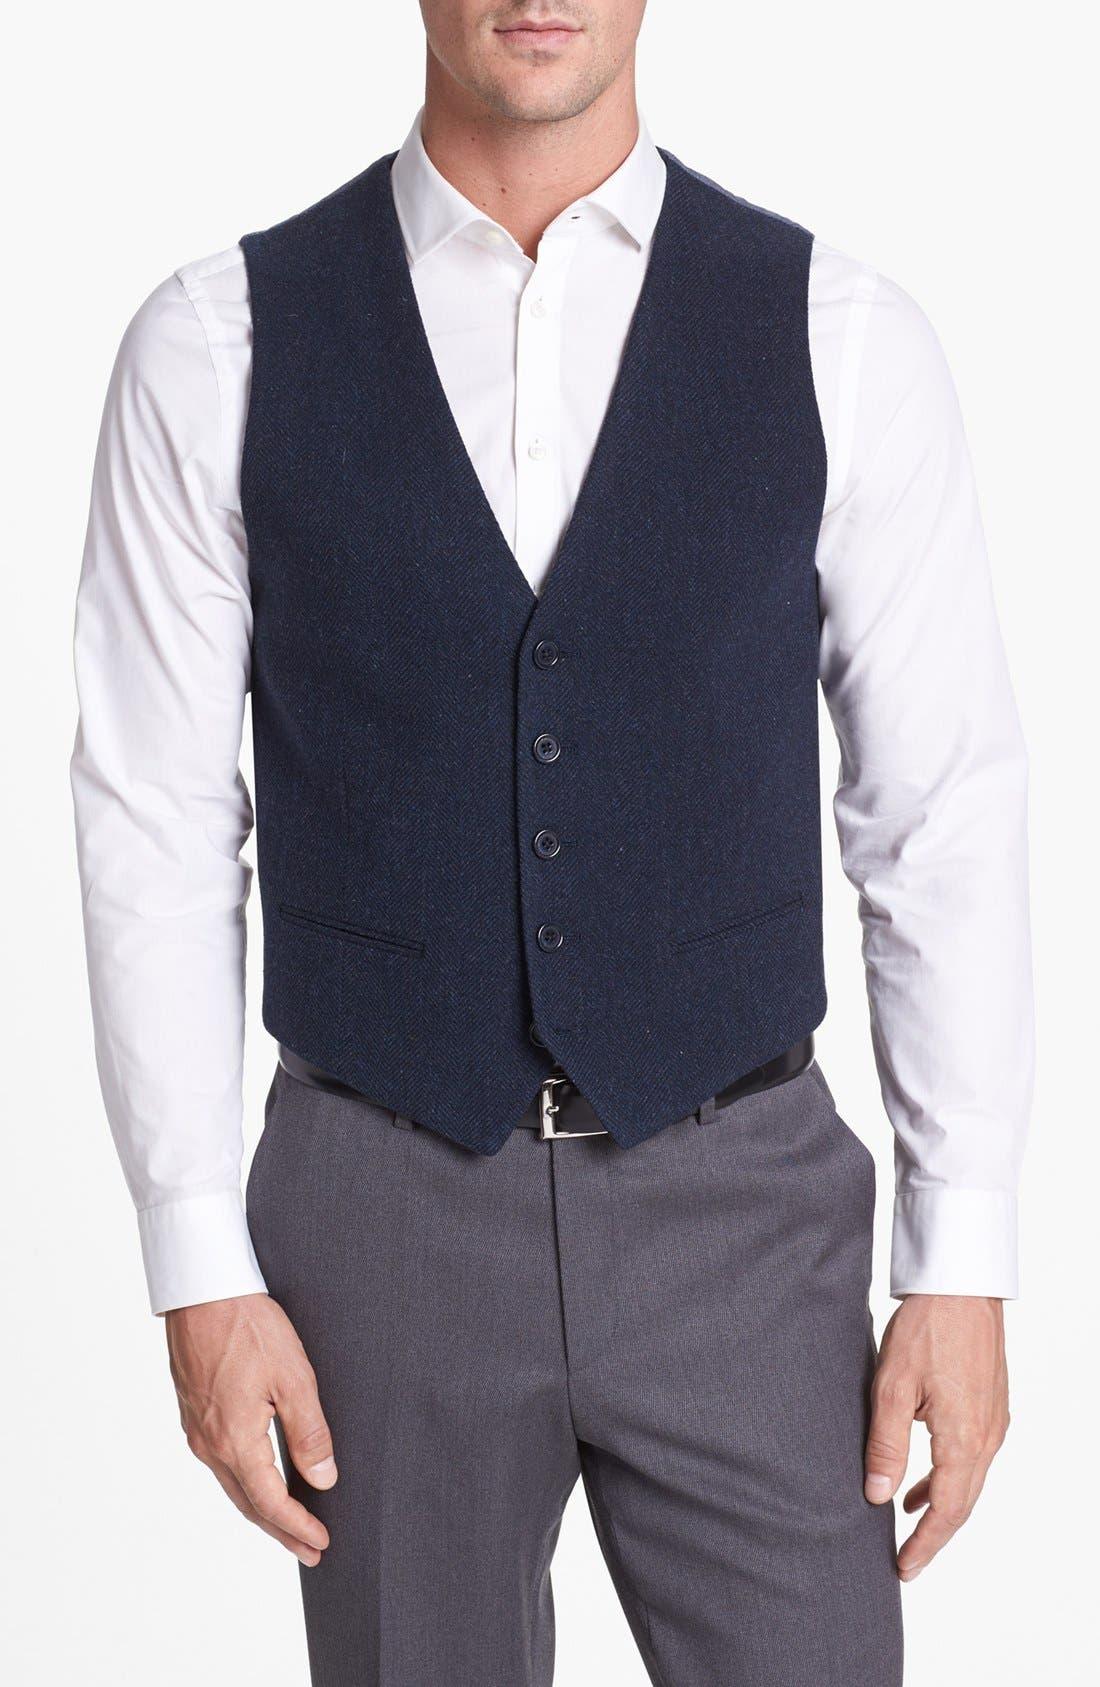 Main Image - Wallin & Bros. Herringbone Vest